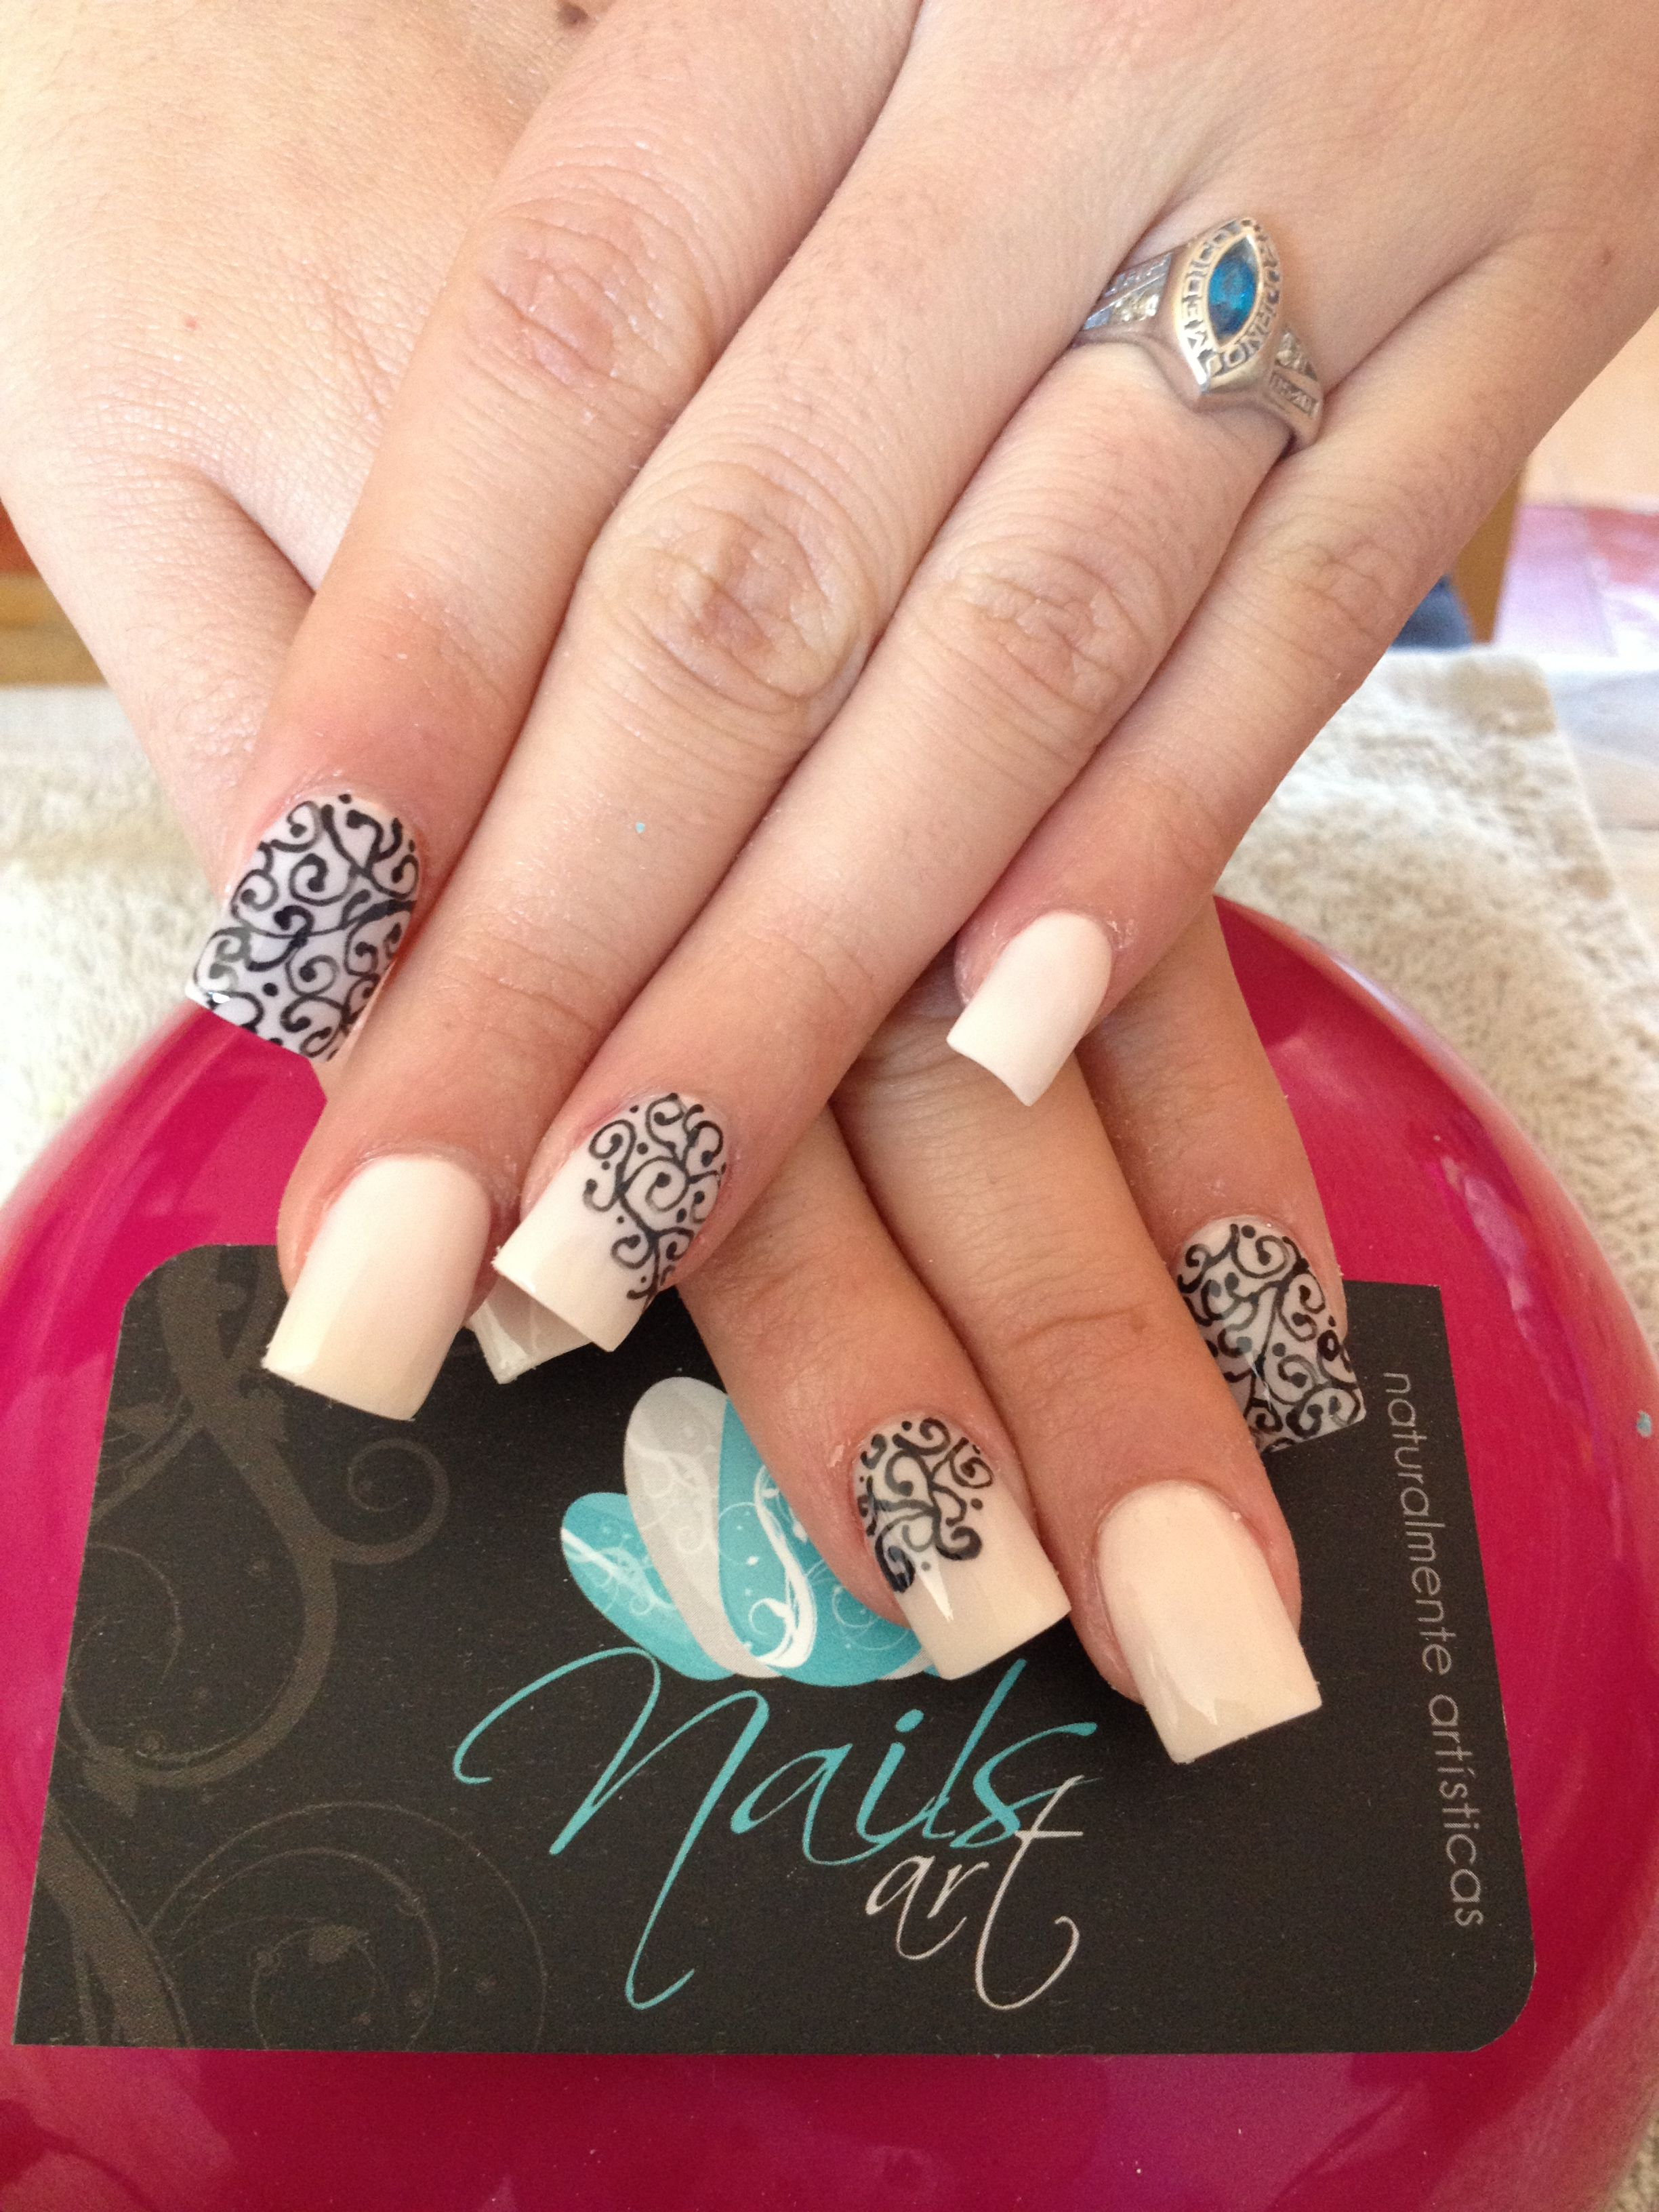 Nails art acrylic nails nude I Am So Doin This Pinterest